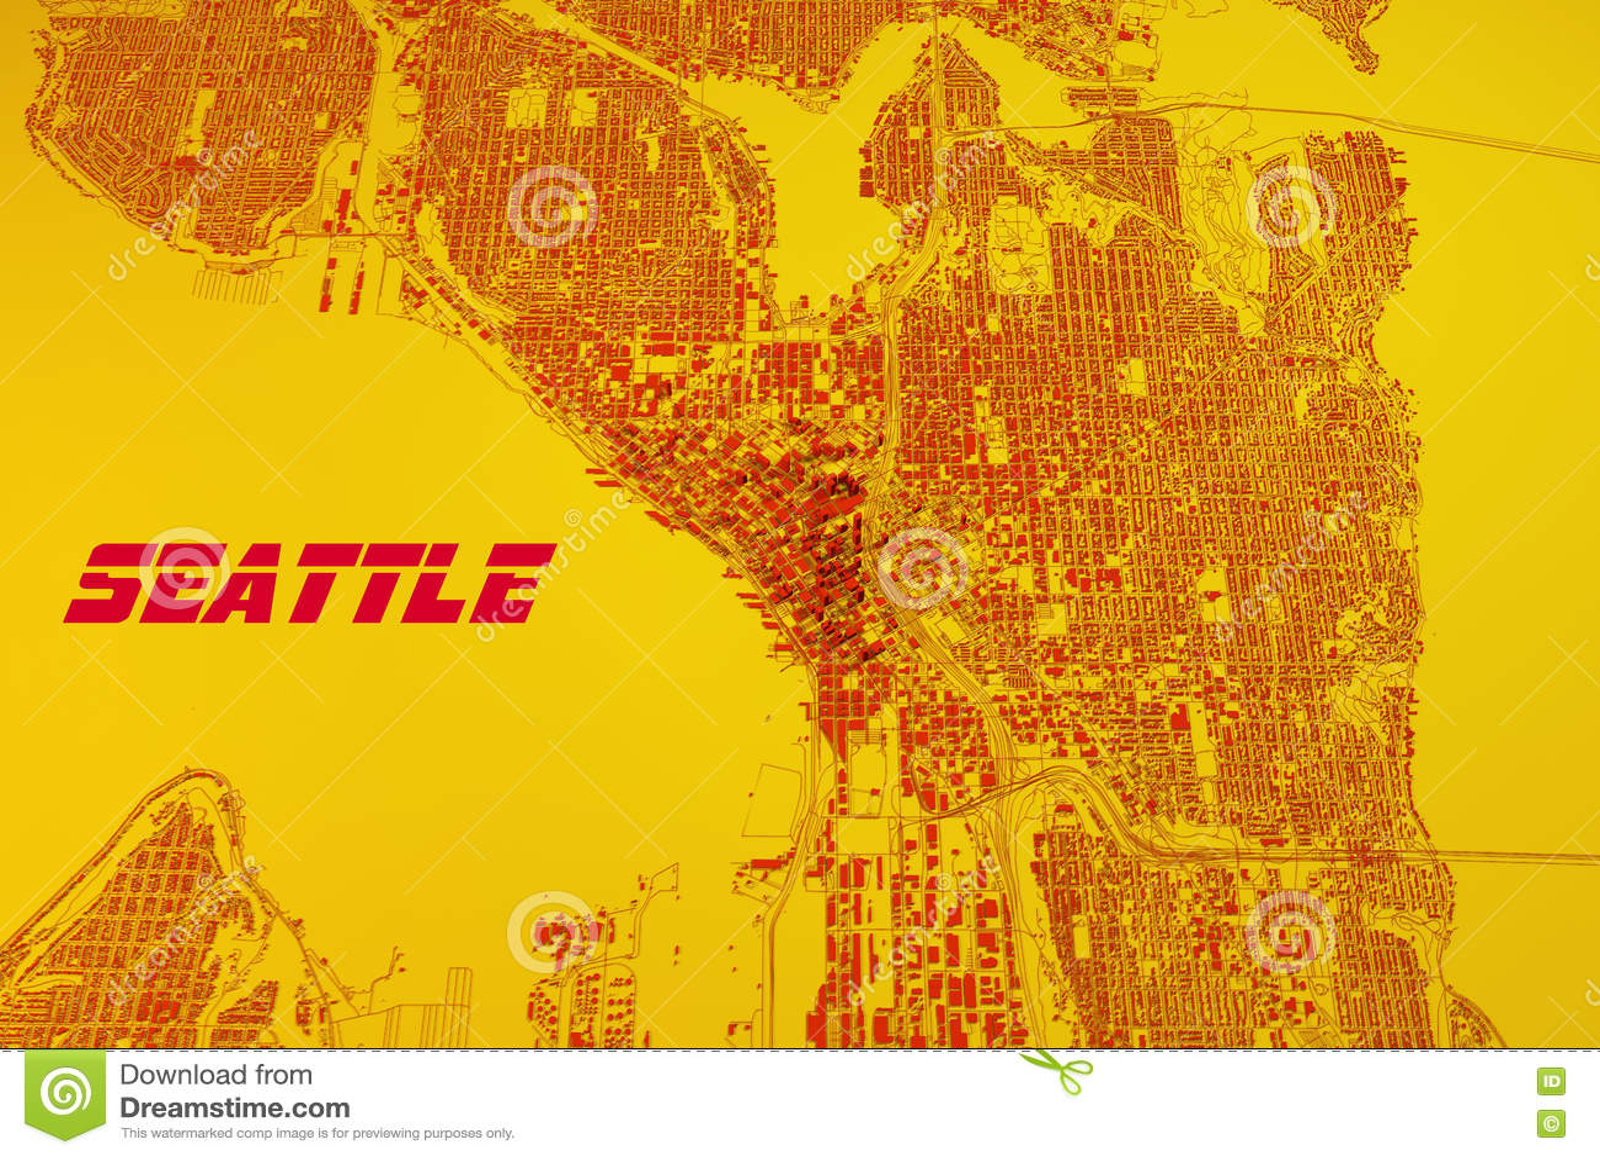 Seattle Map Satellite View United States Stock Illustration